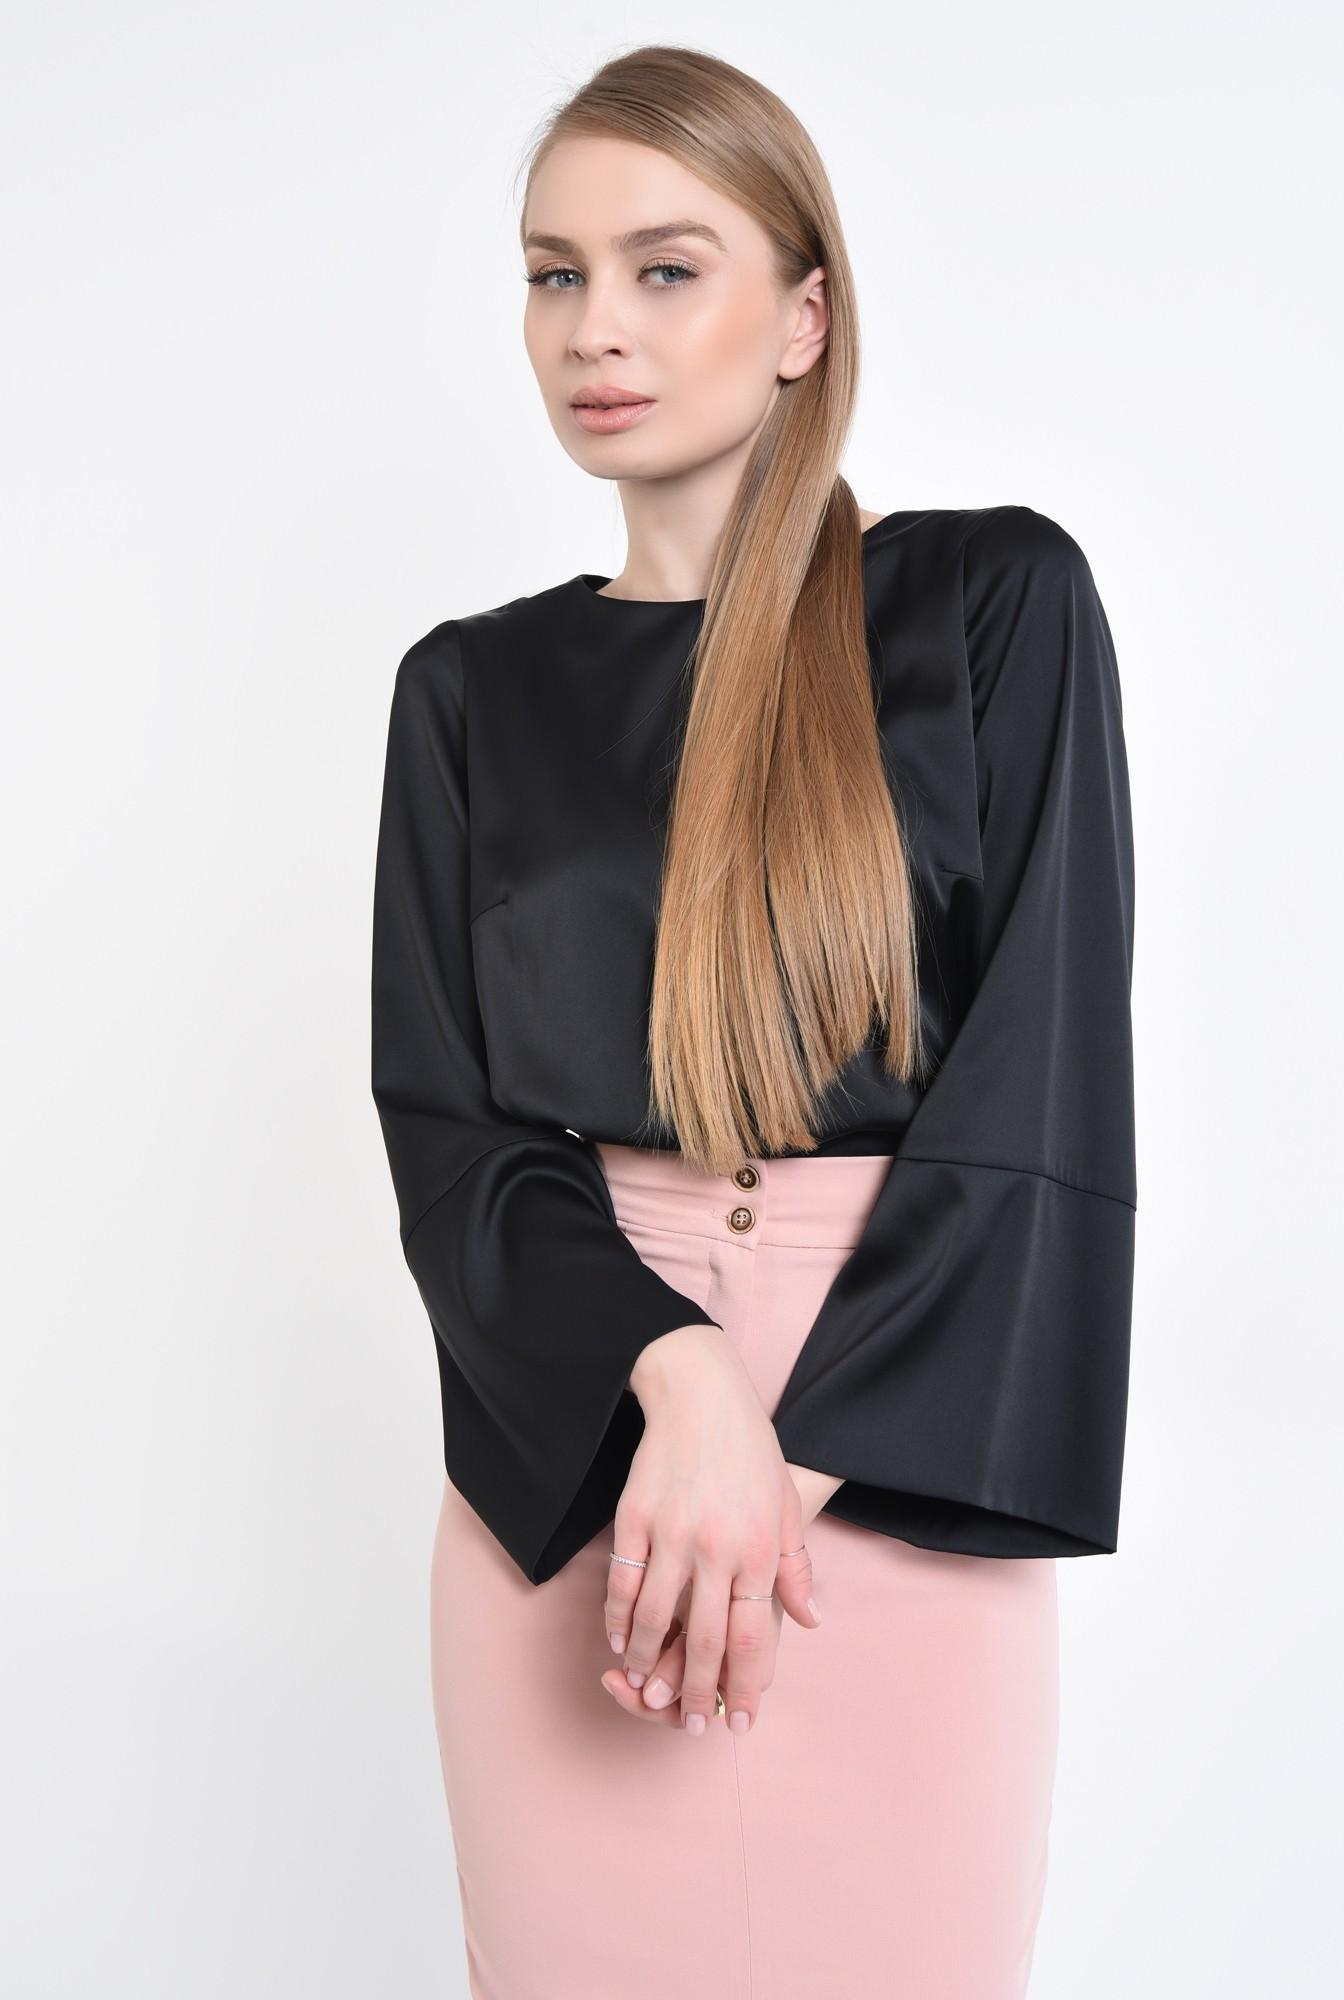 2 - 360 - Bluza casual neagra, mansete, decolteu rotund